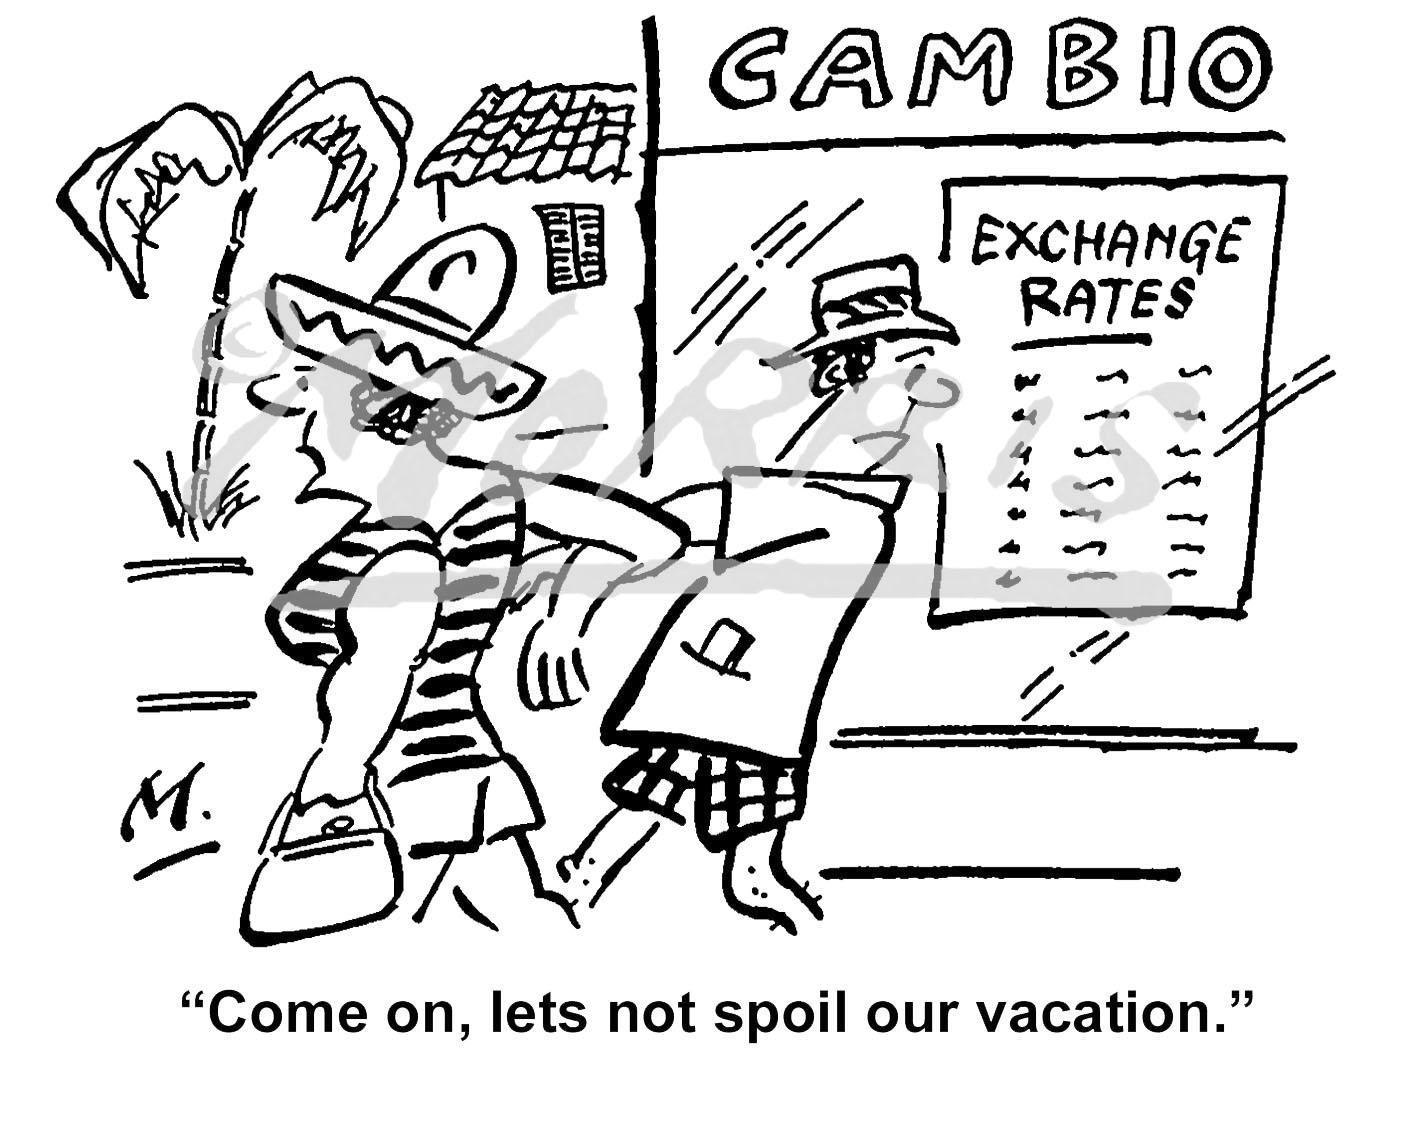 Vacation cartoon, Vacation comic – Ref: 0728bwus